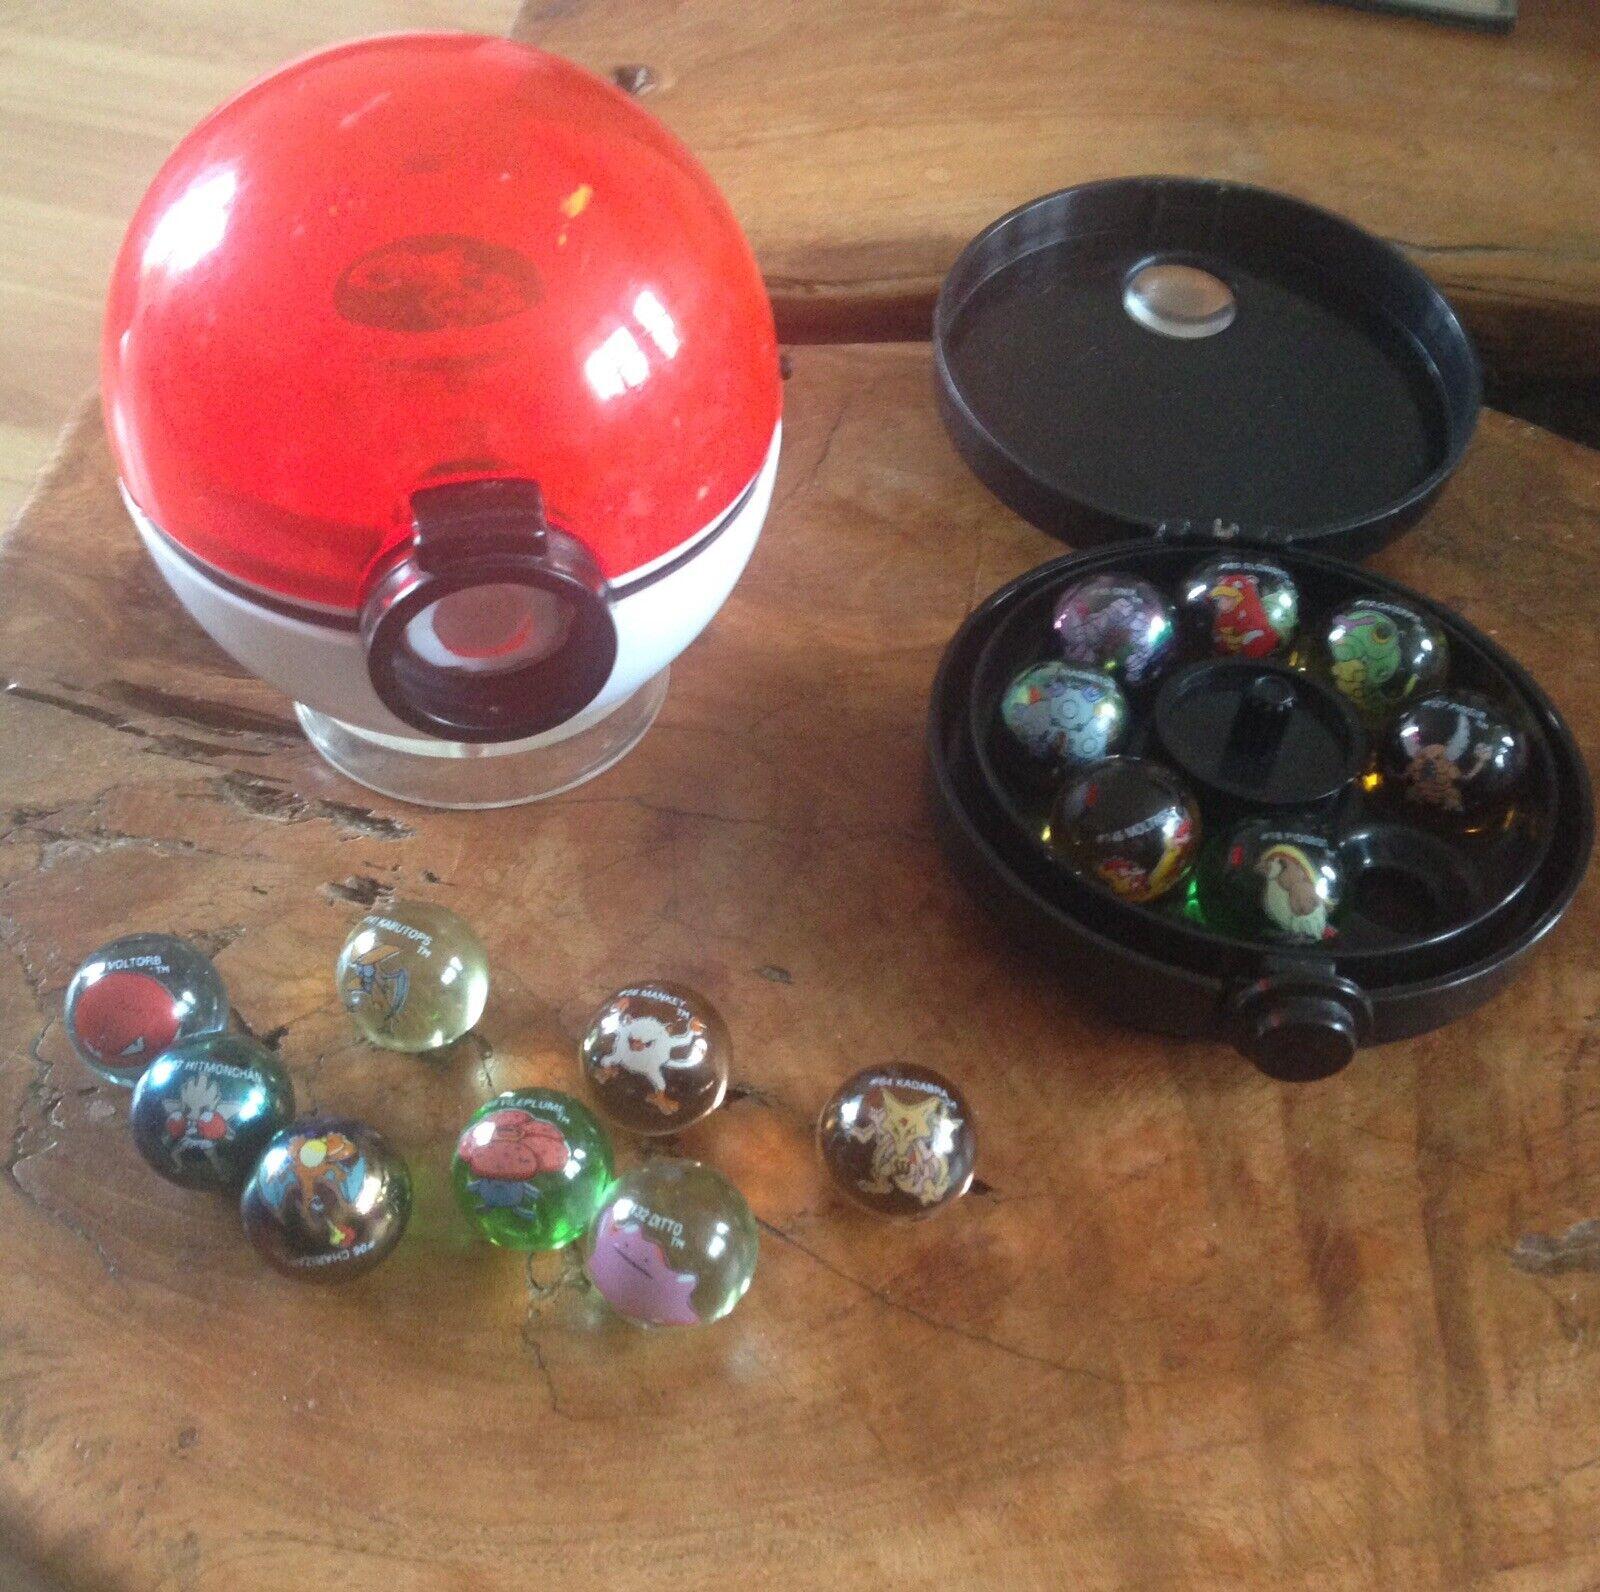 Original Pokemon Charizard Poke Ball, Zappos Viewer, 15 Marbles CHARIZARD  06